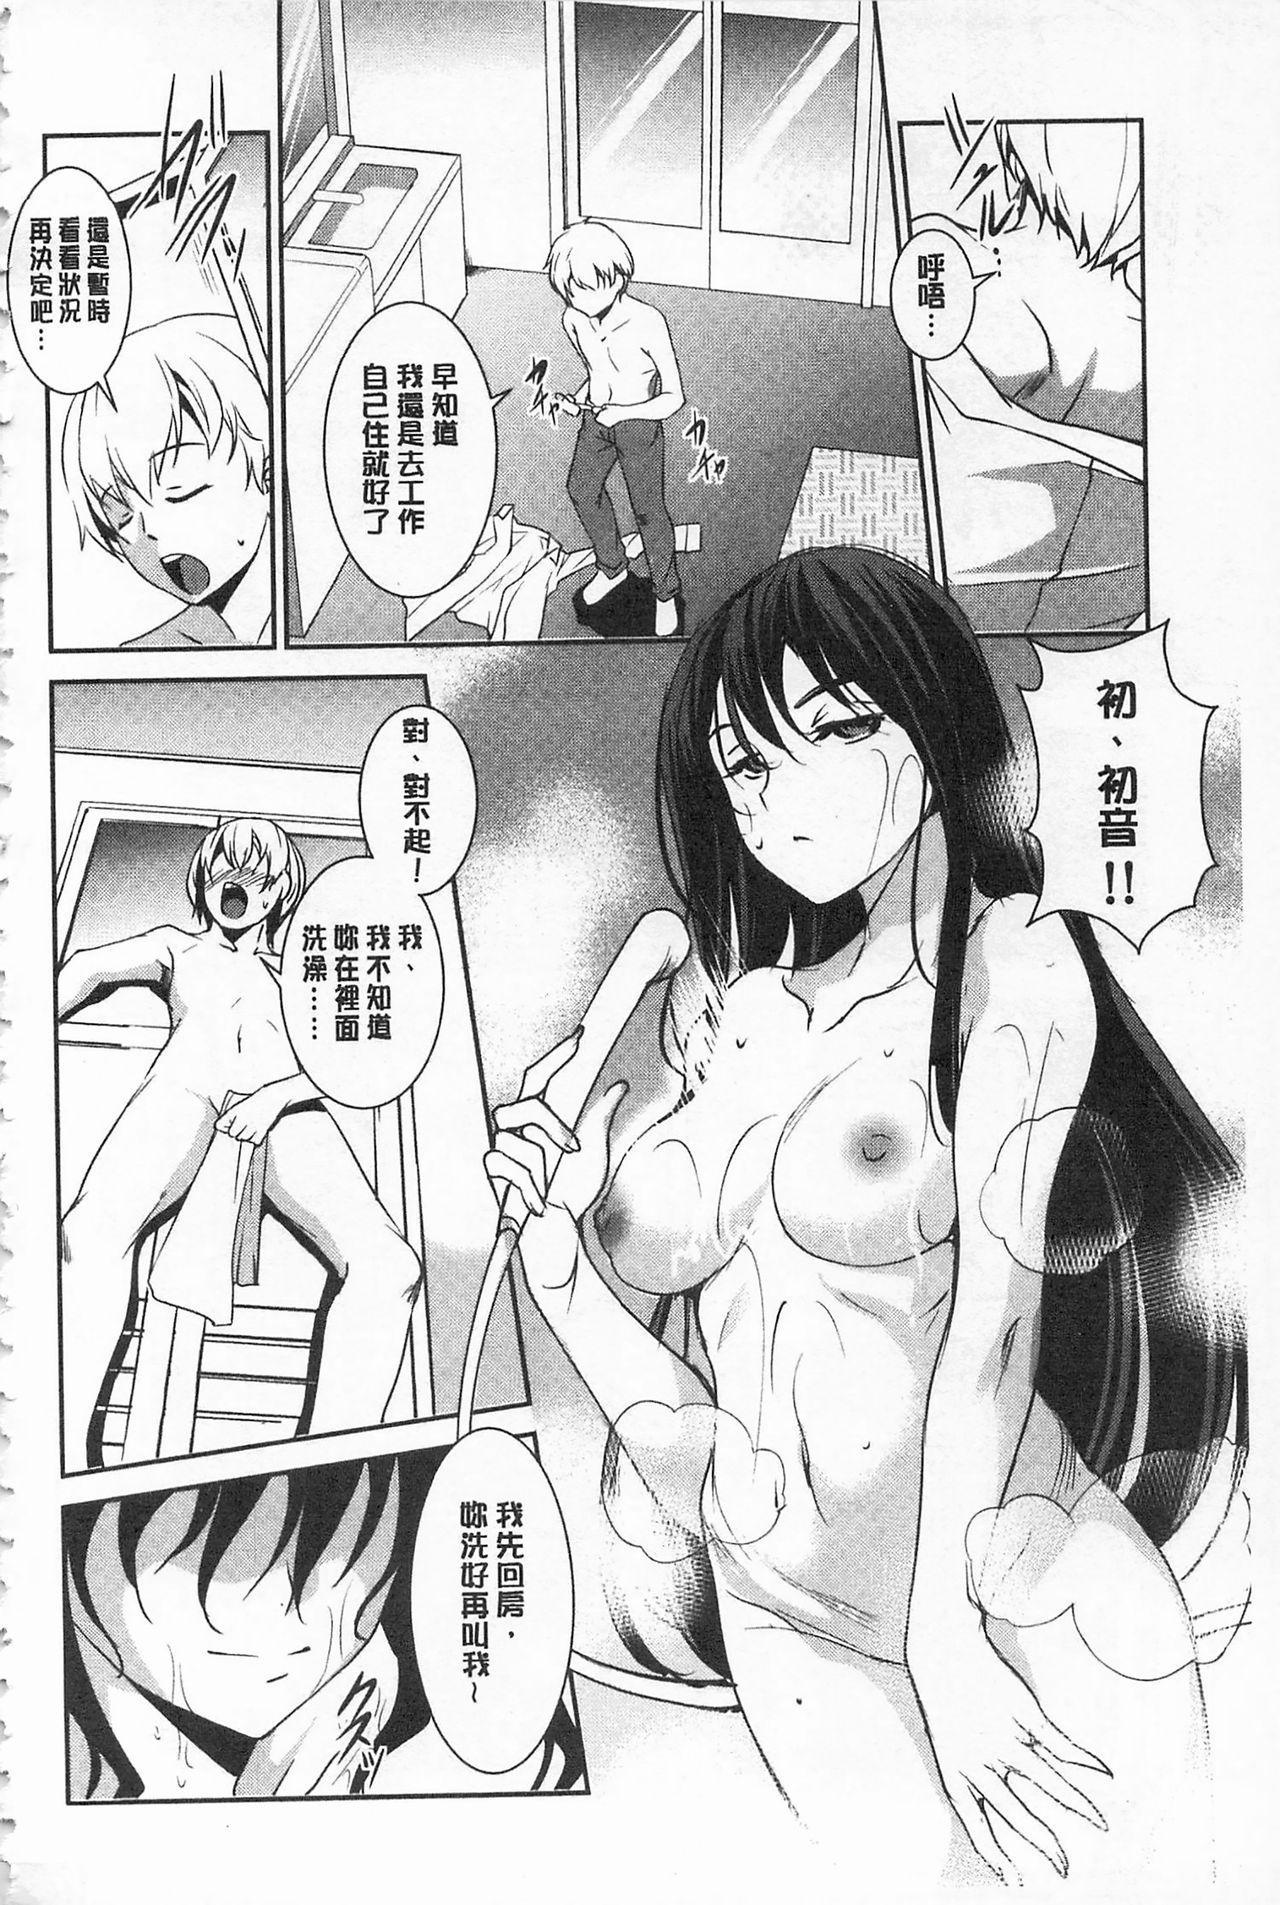 [Amano Kazumi] Seida Inyou -Seijo no Katachi Shita Intou- | 聖墮陰陽 -聖女的容貌與淫蕩- [Chinese] 167